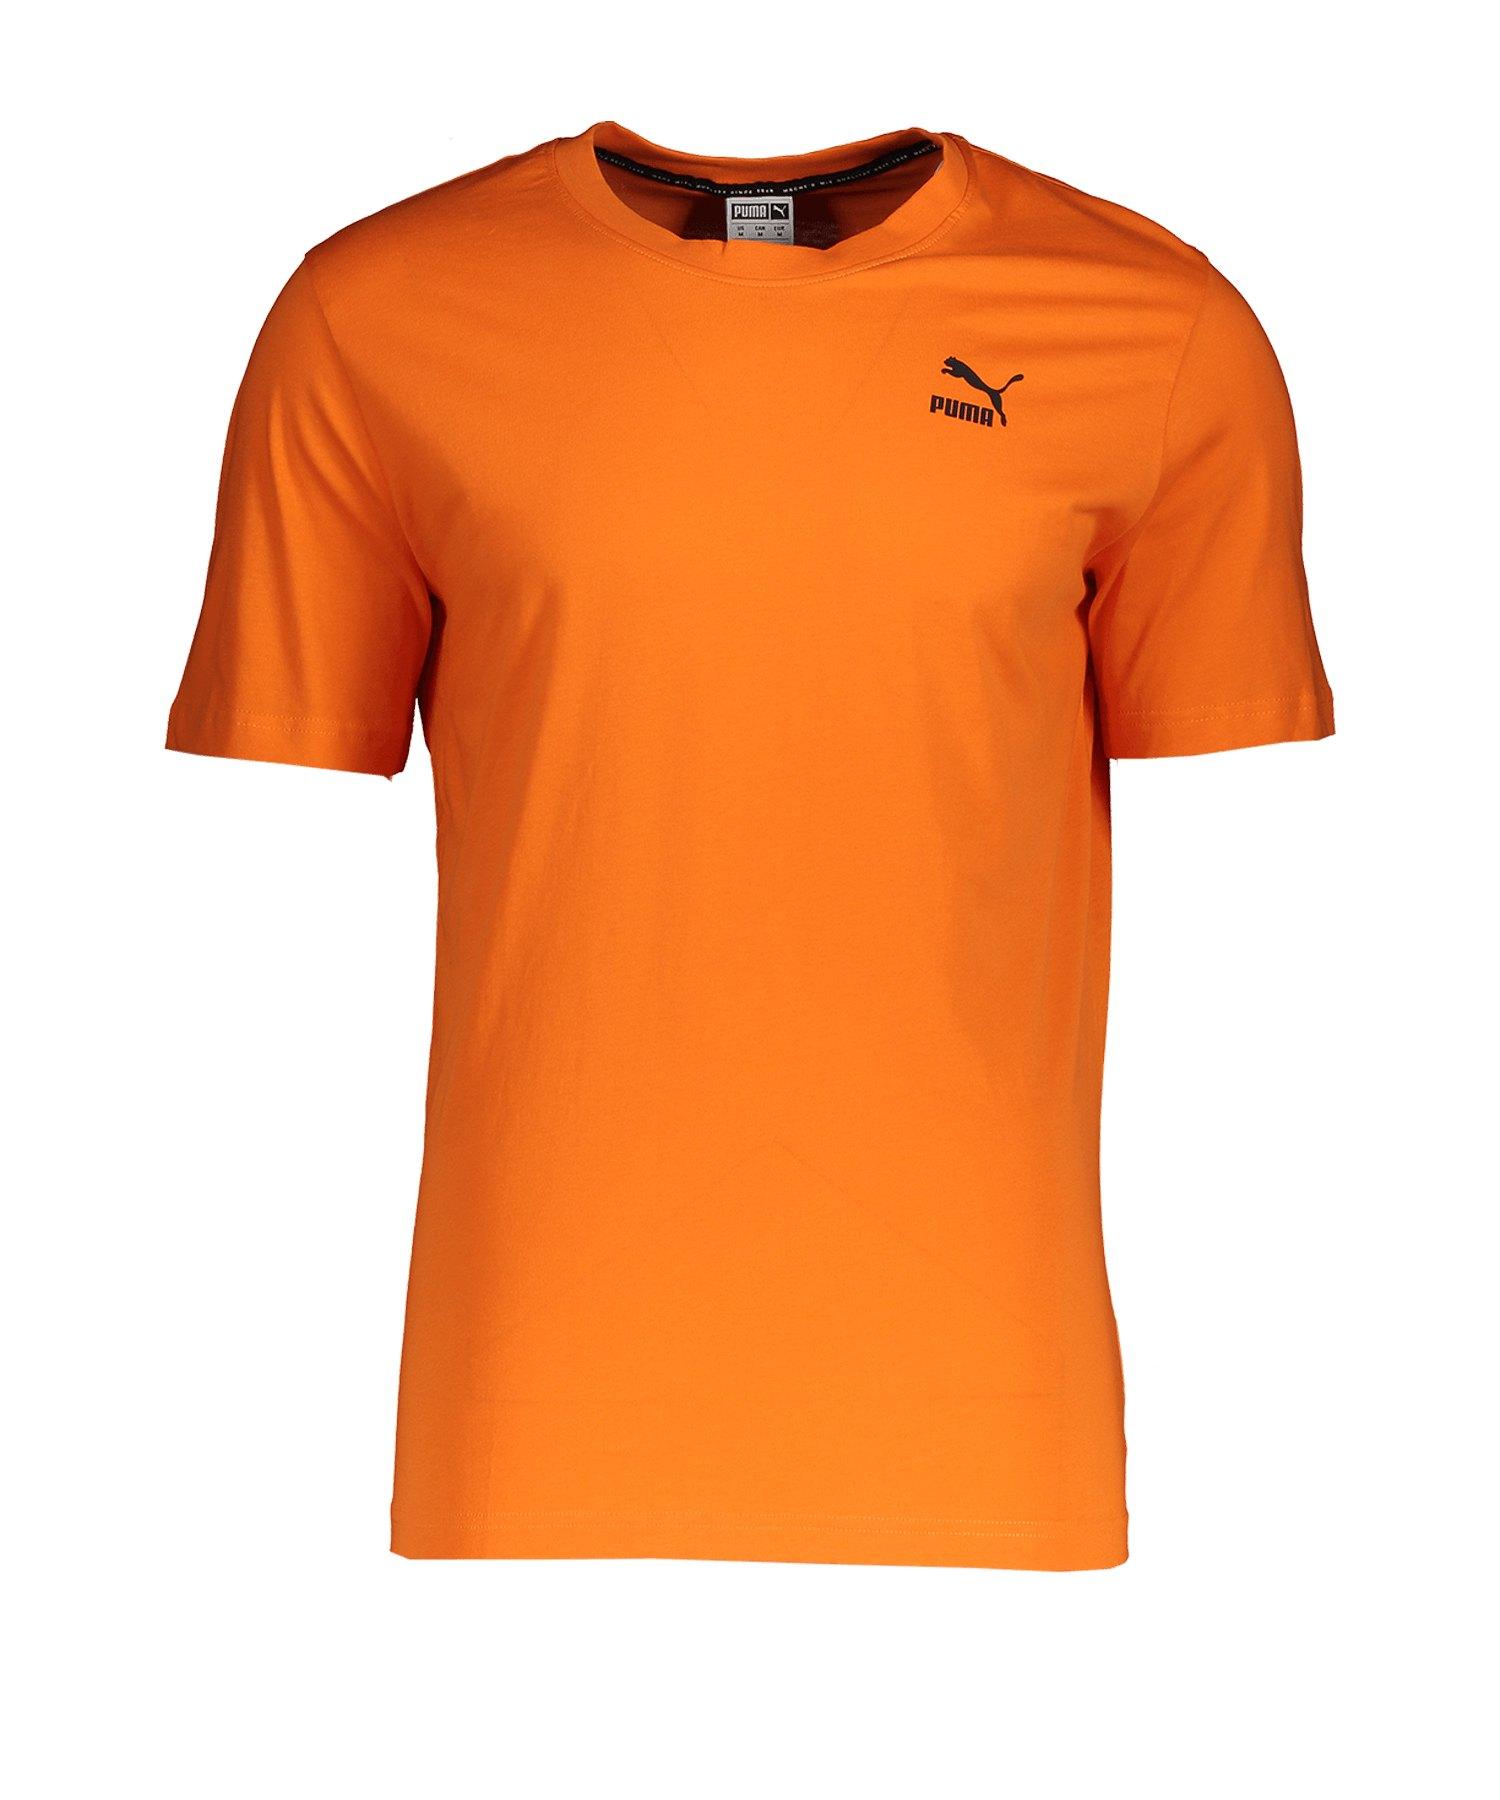 PUMA Recheck Pack Graphic T-Shirt Orange F80 - orange